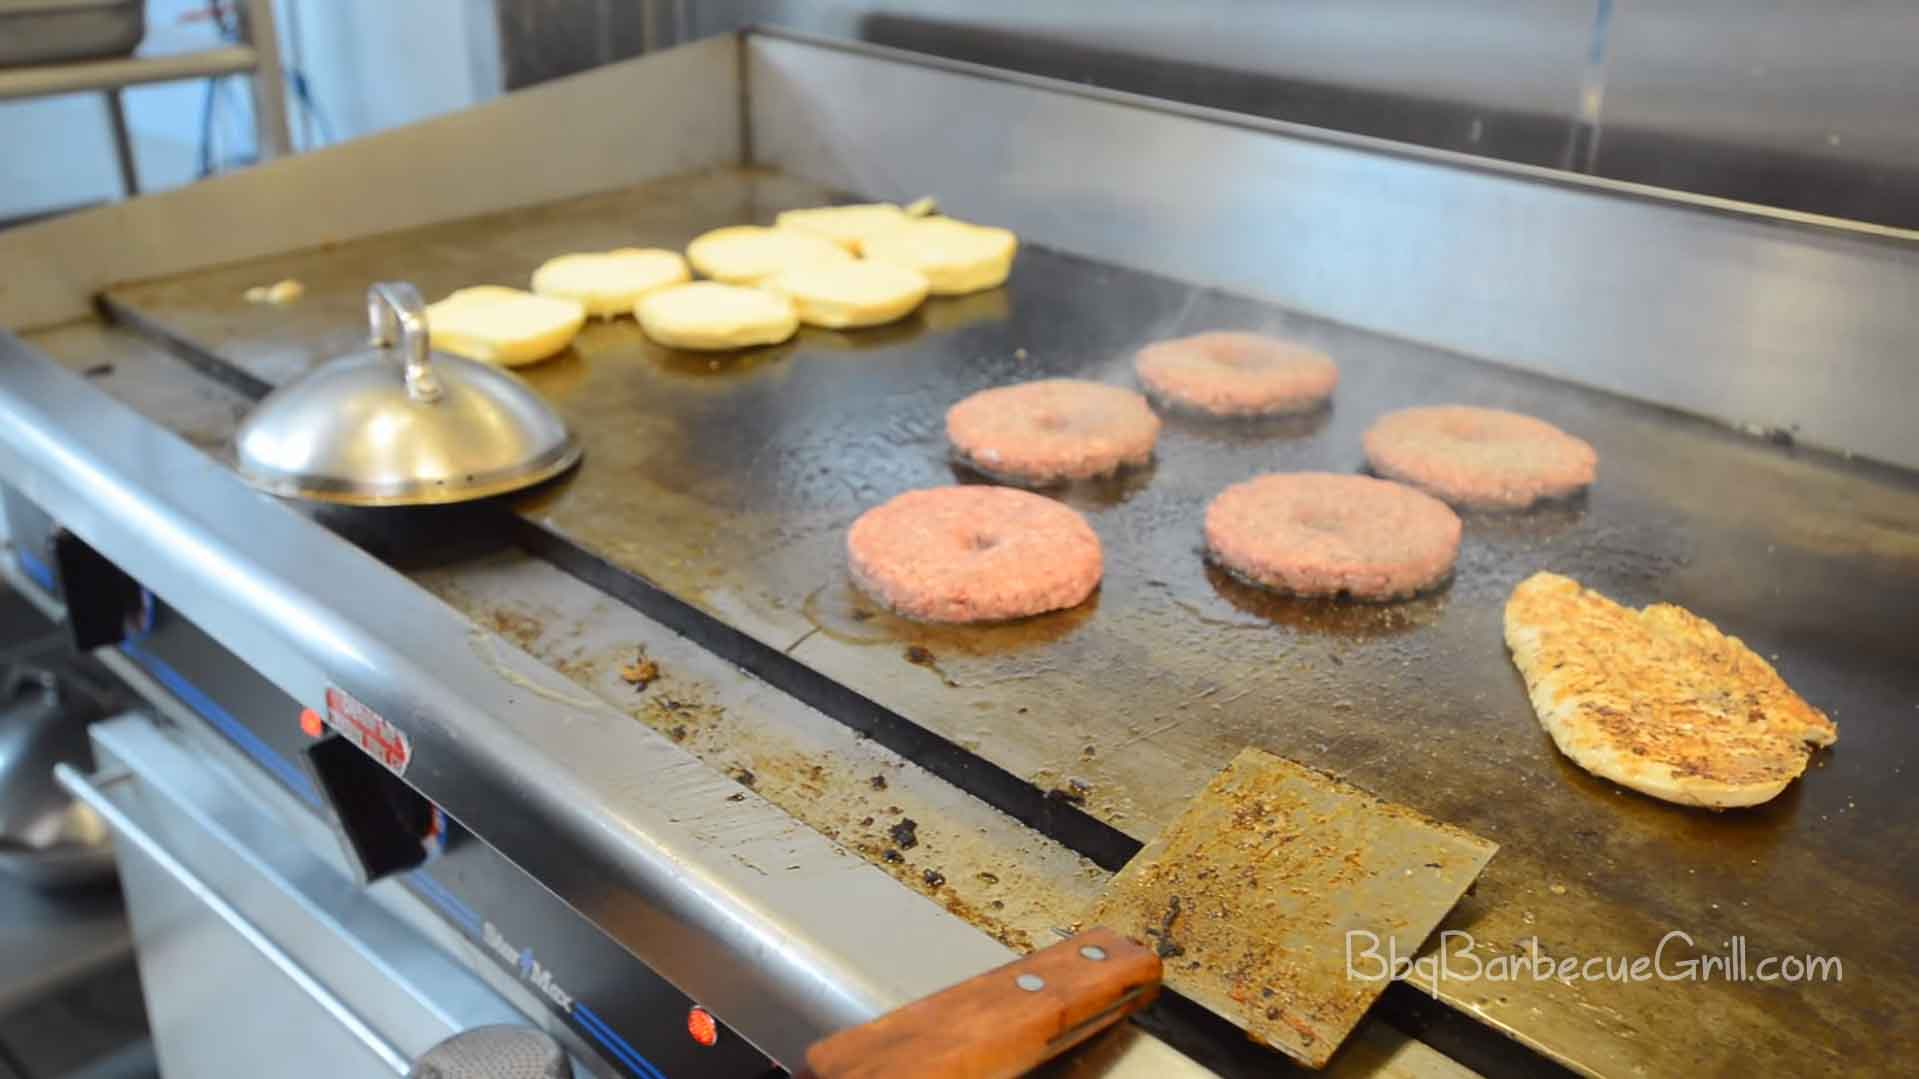 Flat top grill vs regular grill